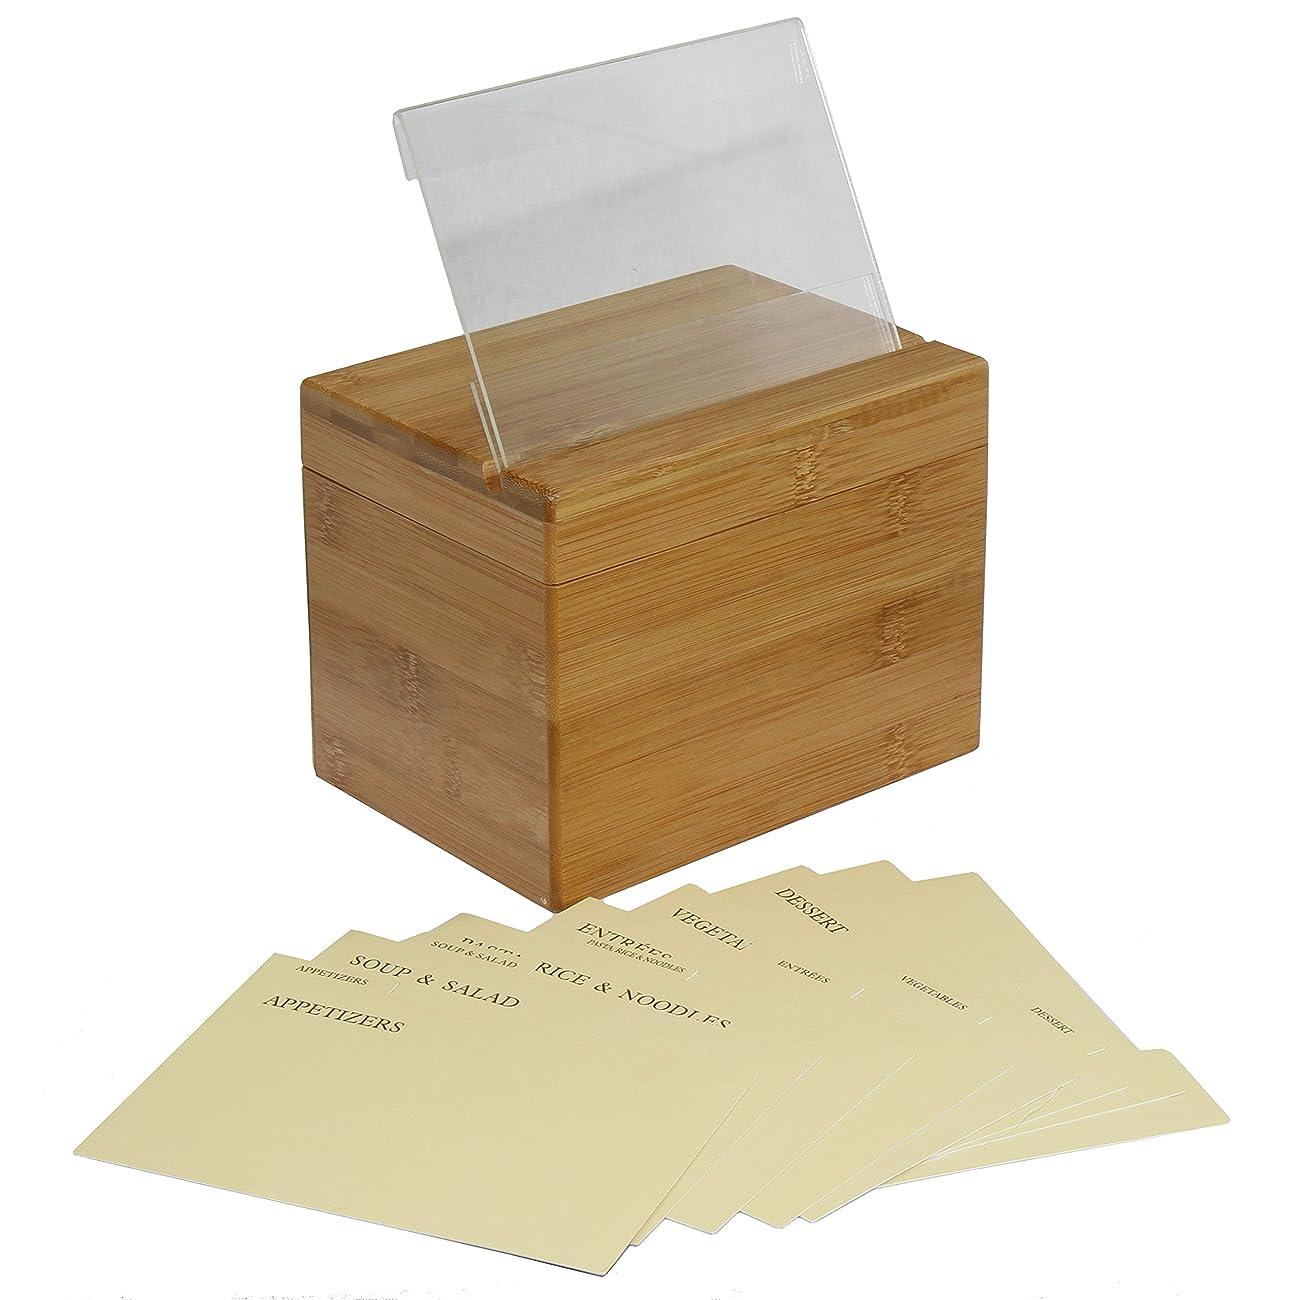 Oceanstar Bamboo Recipe Box with Divider, Natural 2